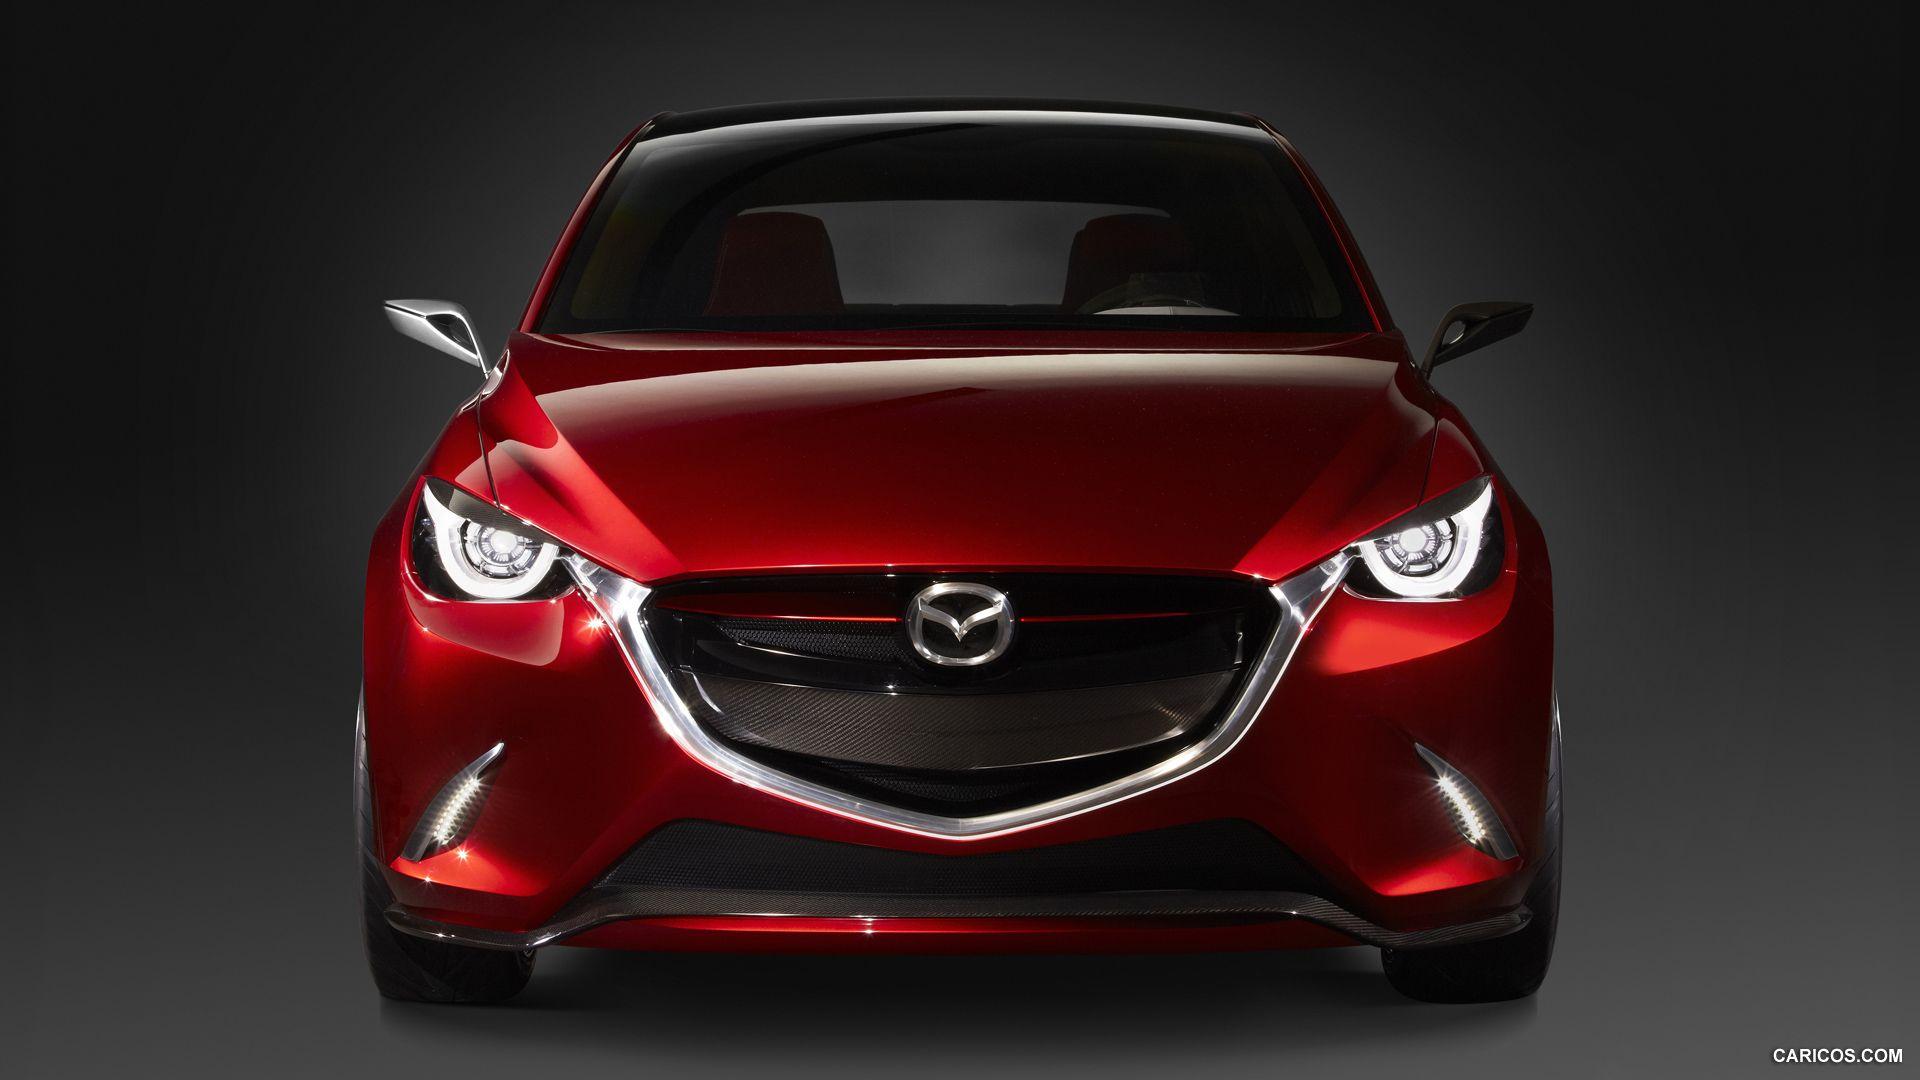 2014 Mazda Hazumi Concept - Front | conseptcar | Pinterest | Mazda ...